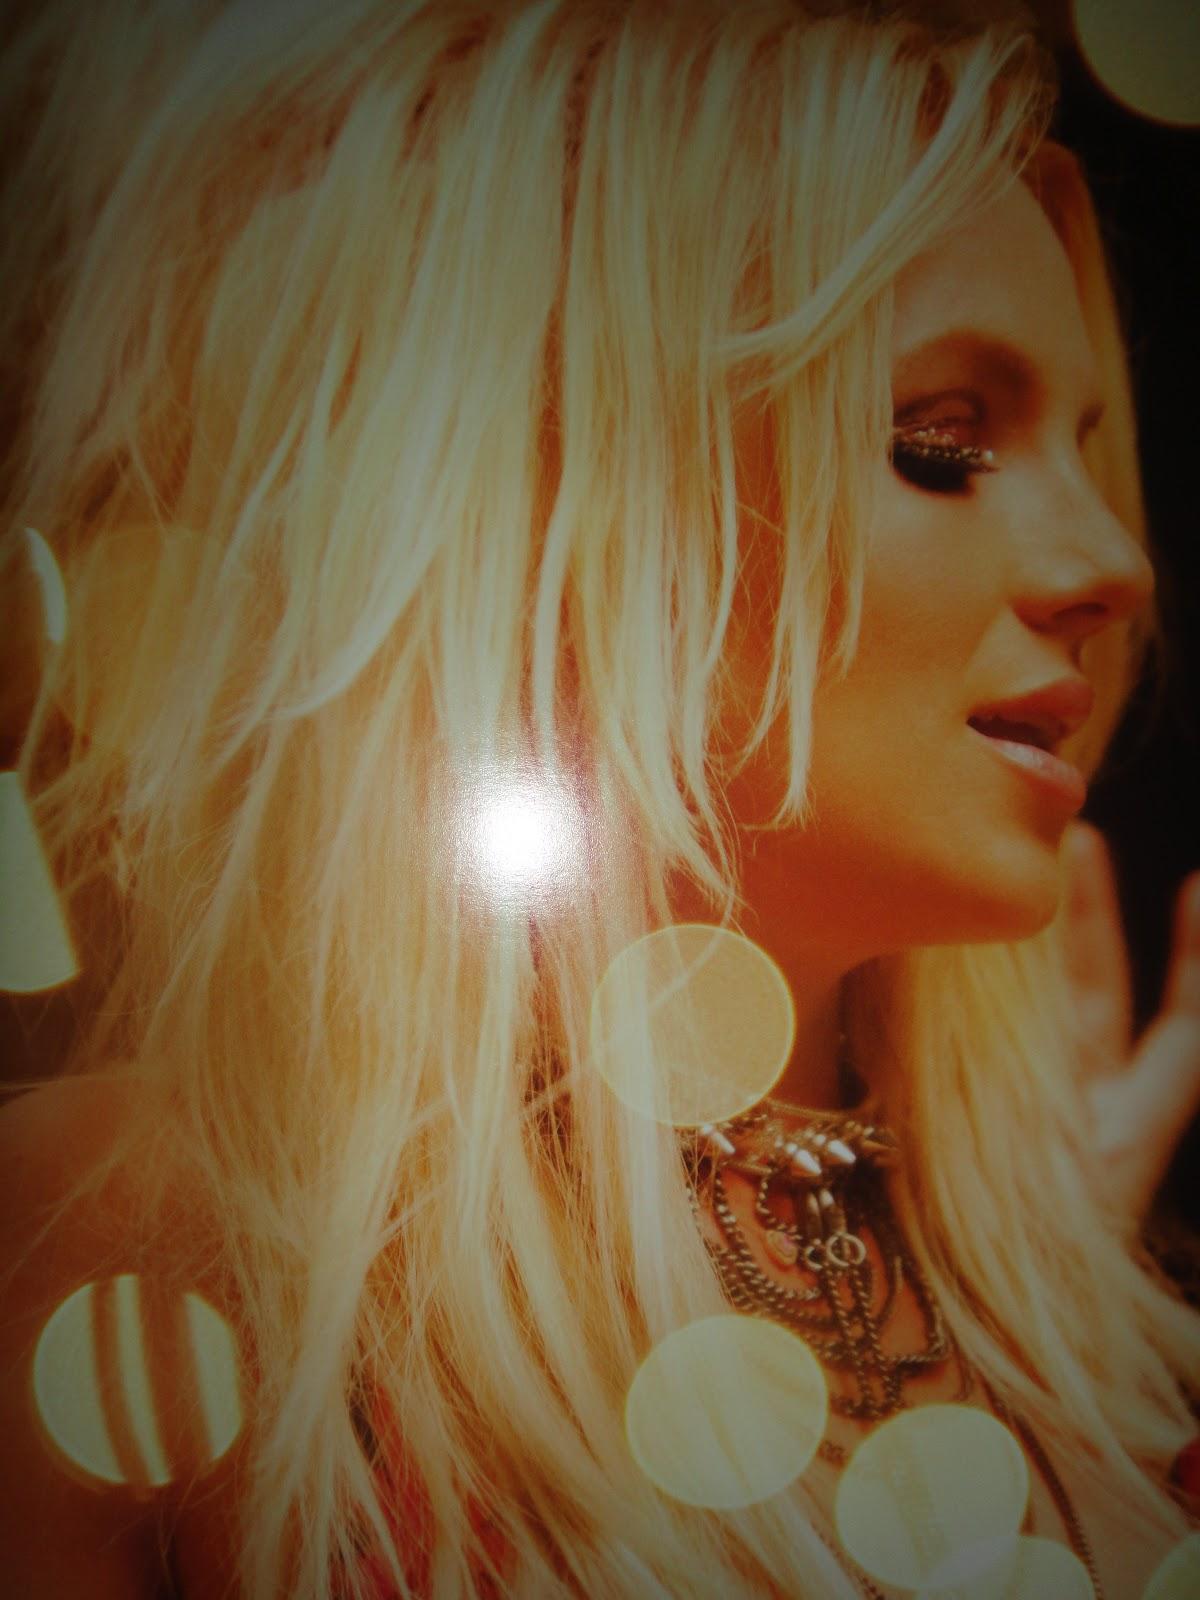 Britney grayson dissertation